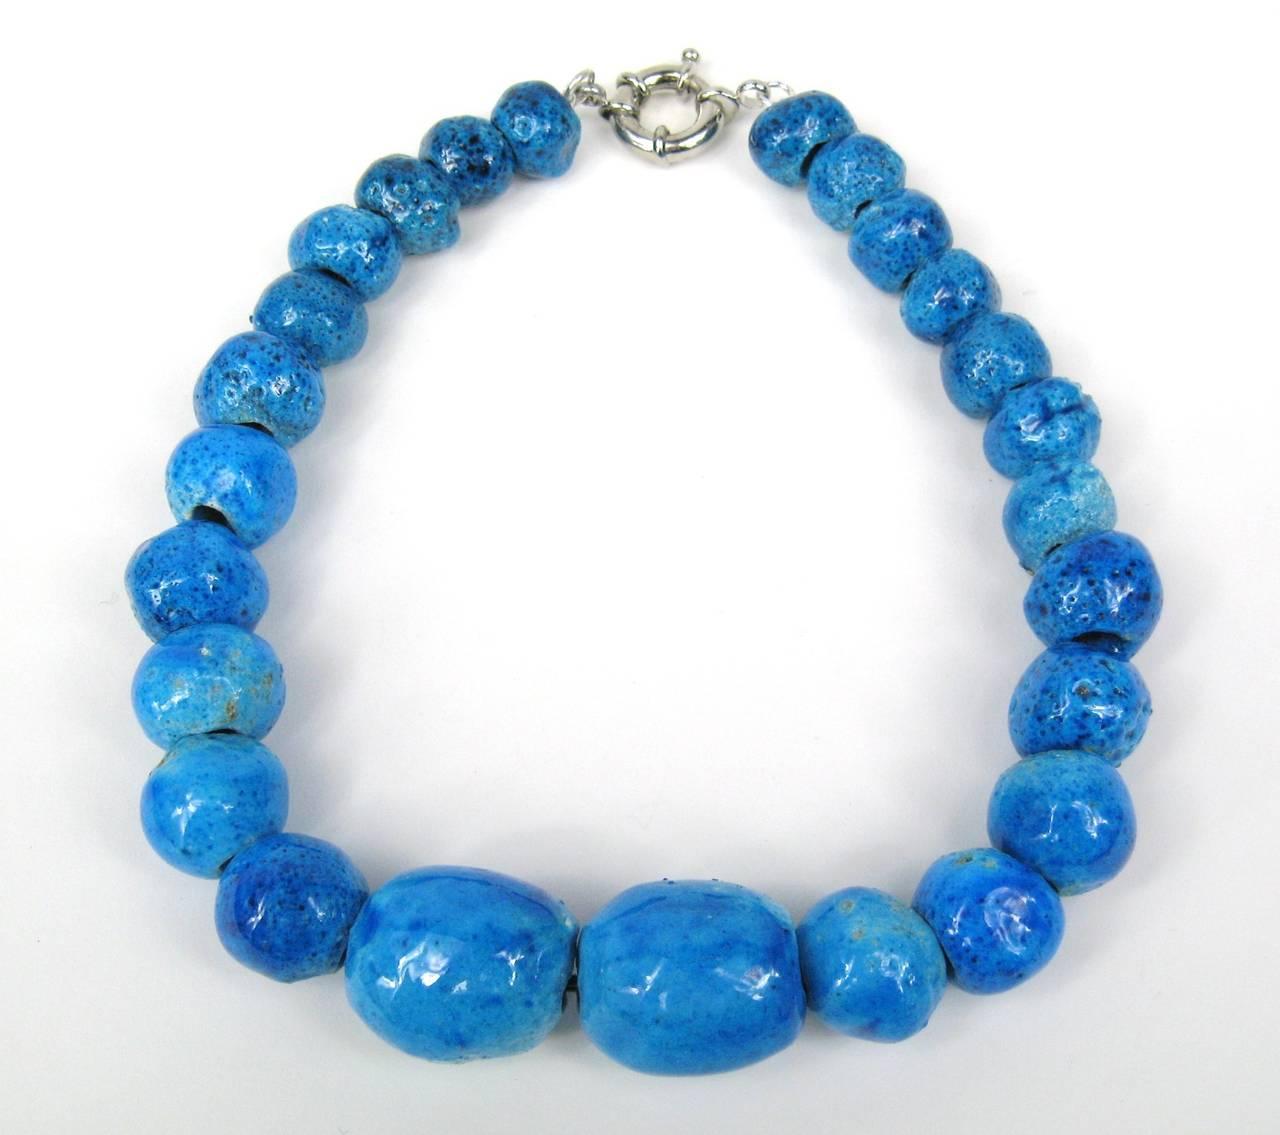 Oversized Ceramic Porcelain Blue Bead Necklace 2